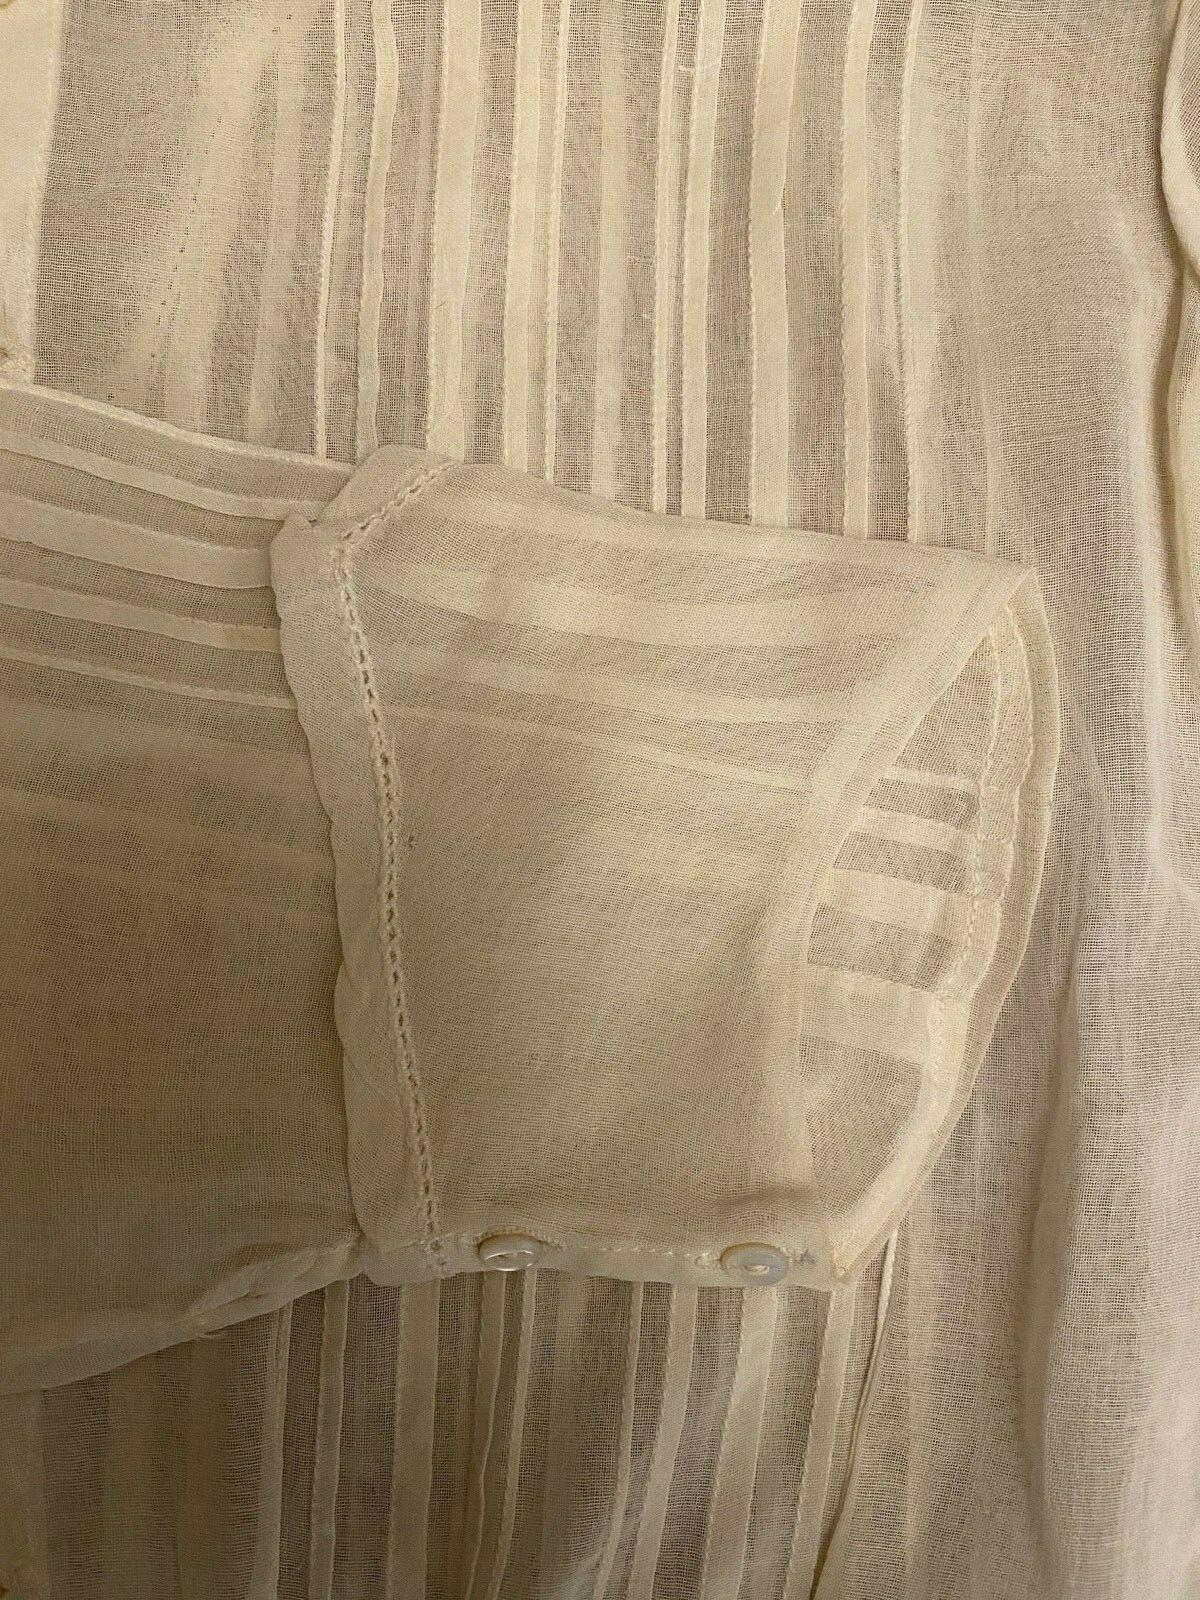 Antique Victorian Ladies  Blouse High Neck - image 4